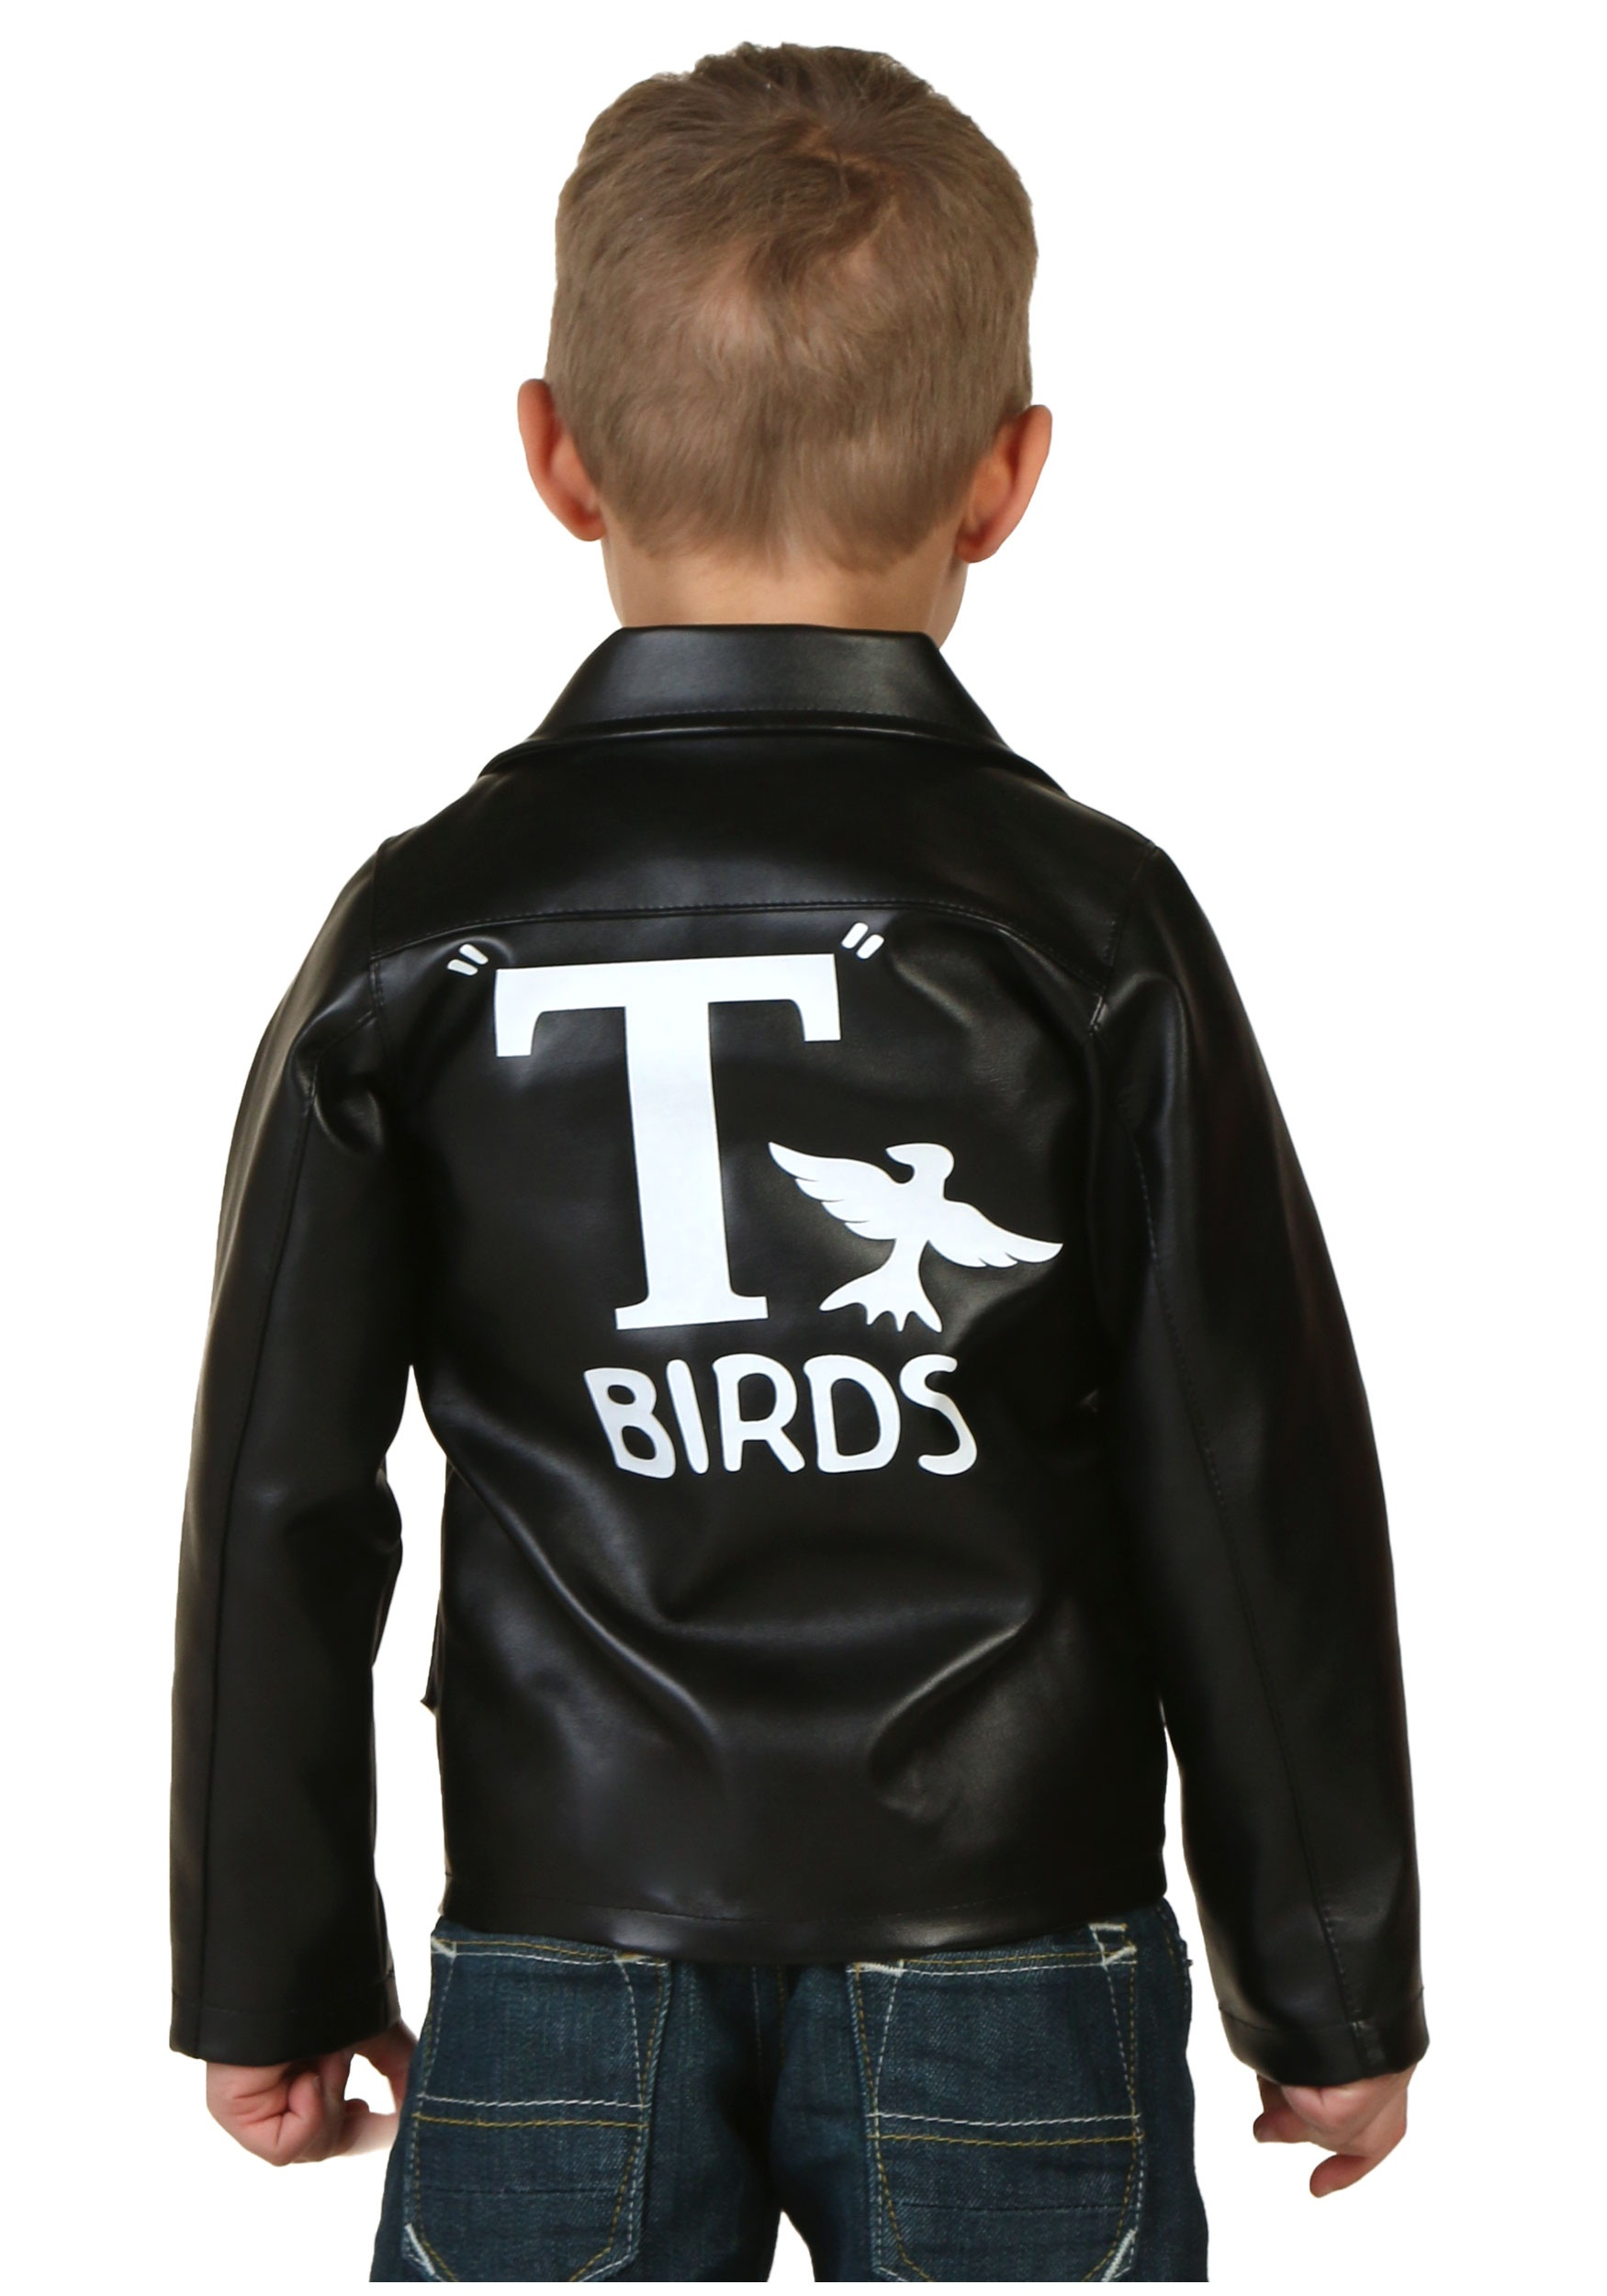 T birds jacket for sandy